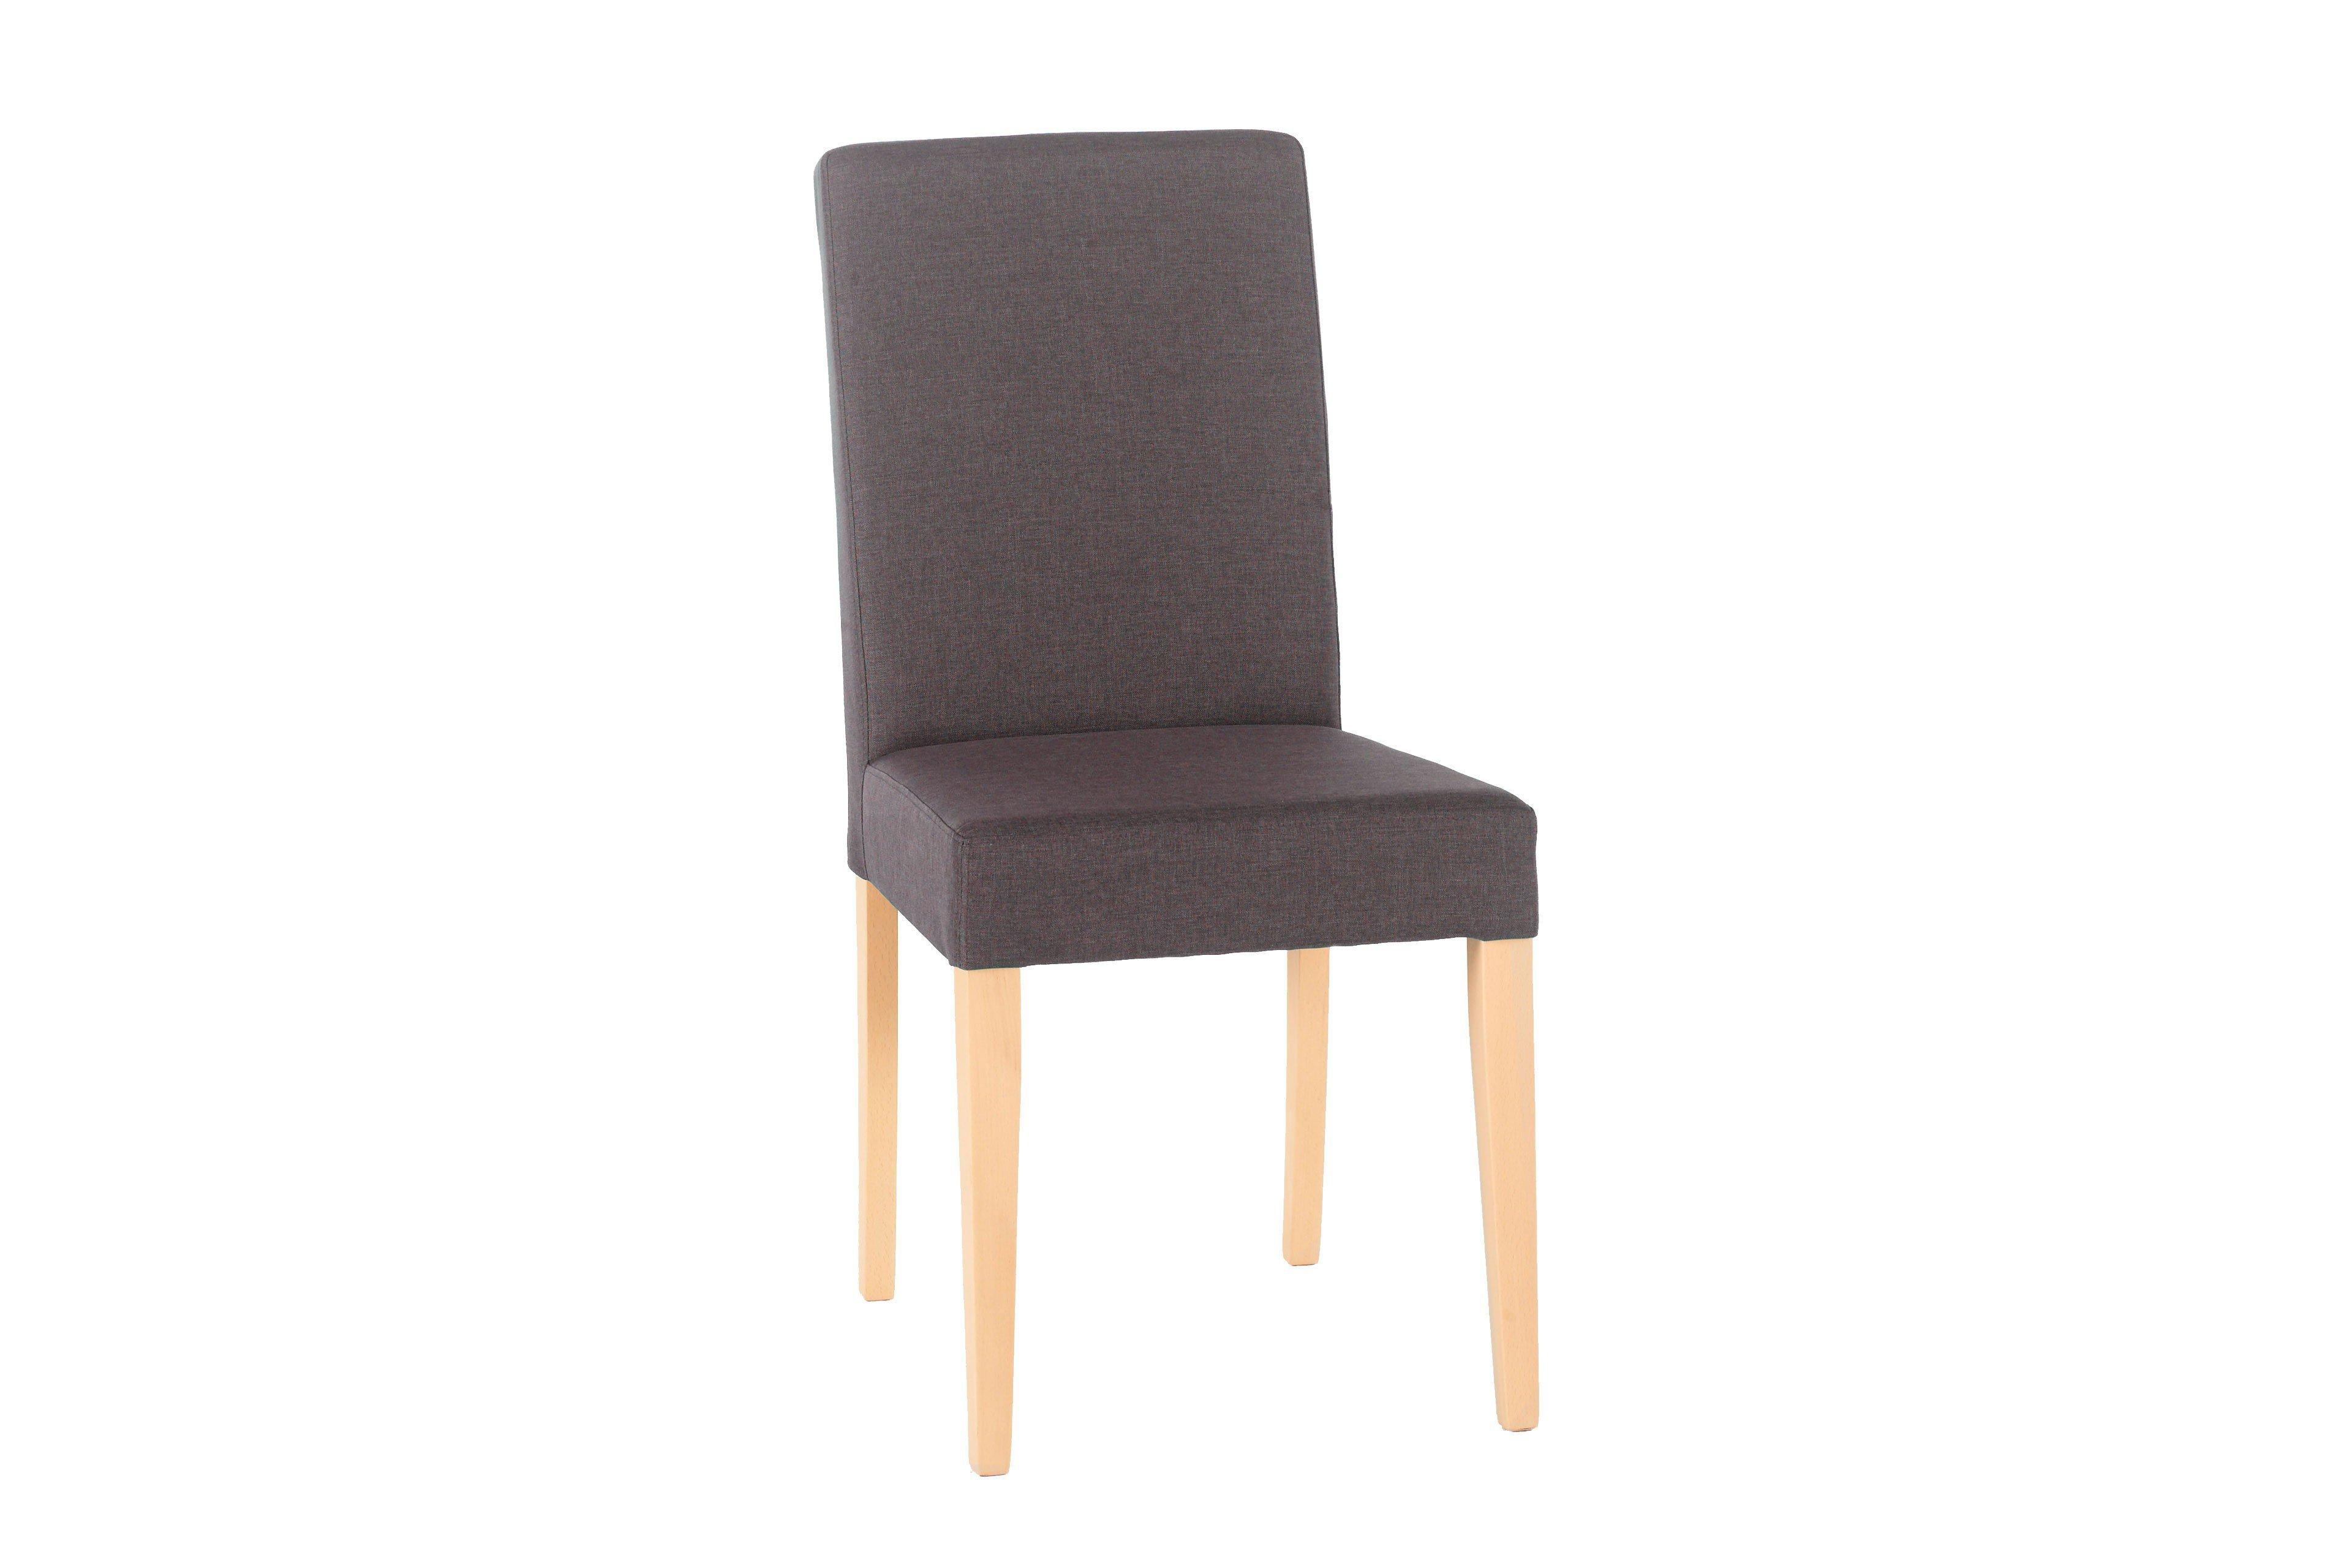 standard furniture stuhl ellen in buche braun m bel. Black Bedroom Furniture Sets. Home Design Ideas